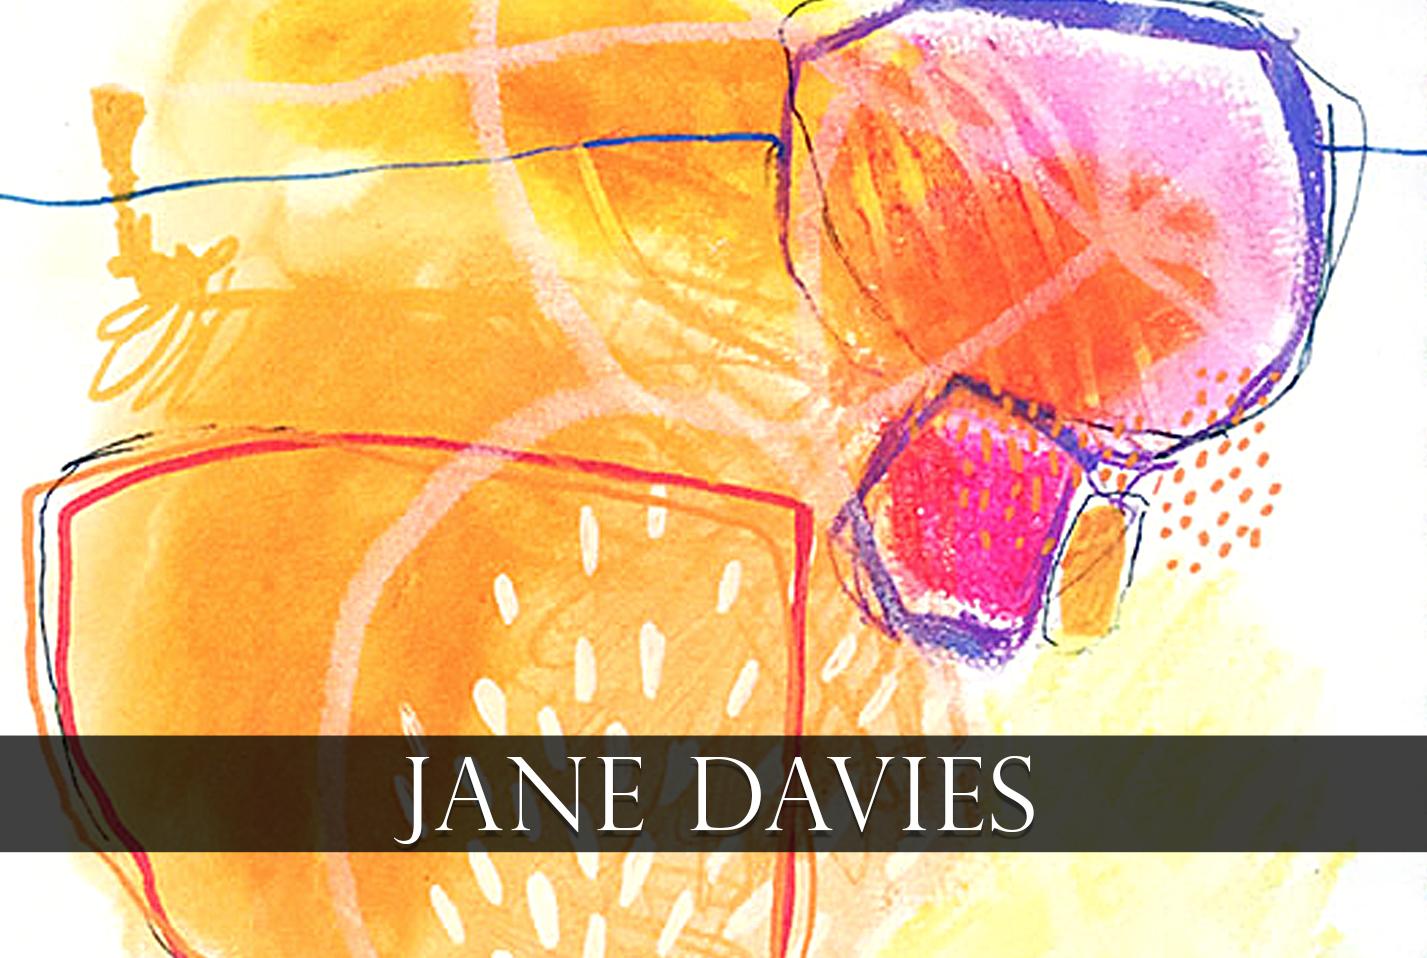 Jane Davies Winter Workshop Event Page Picture